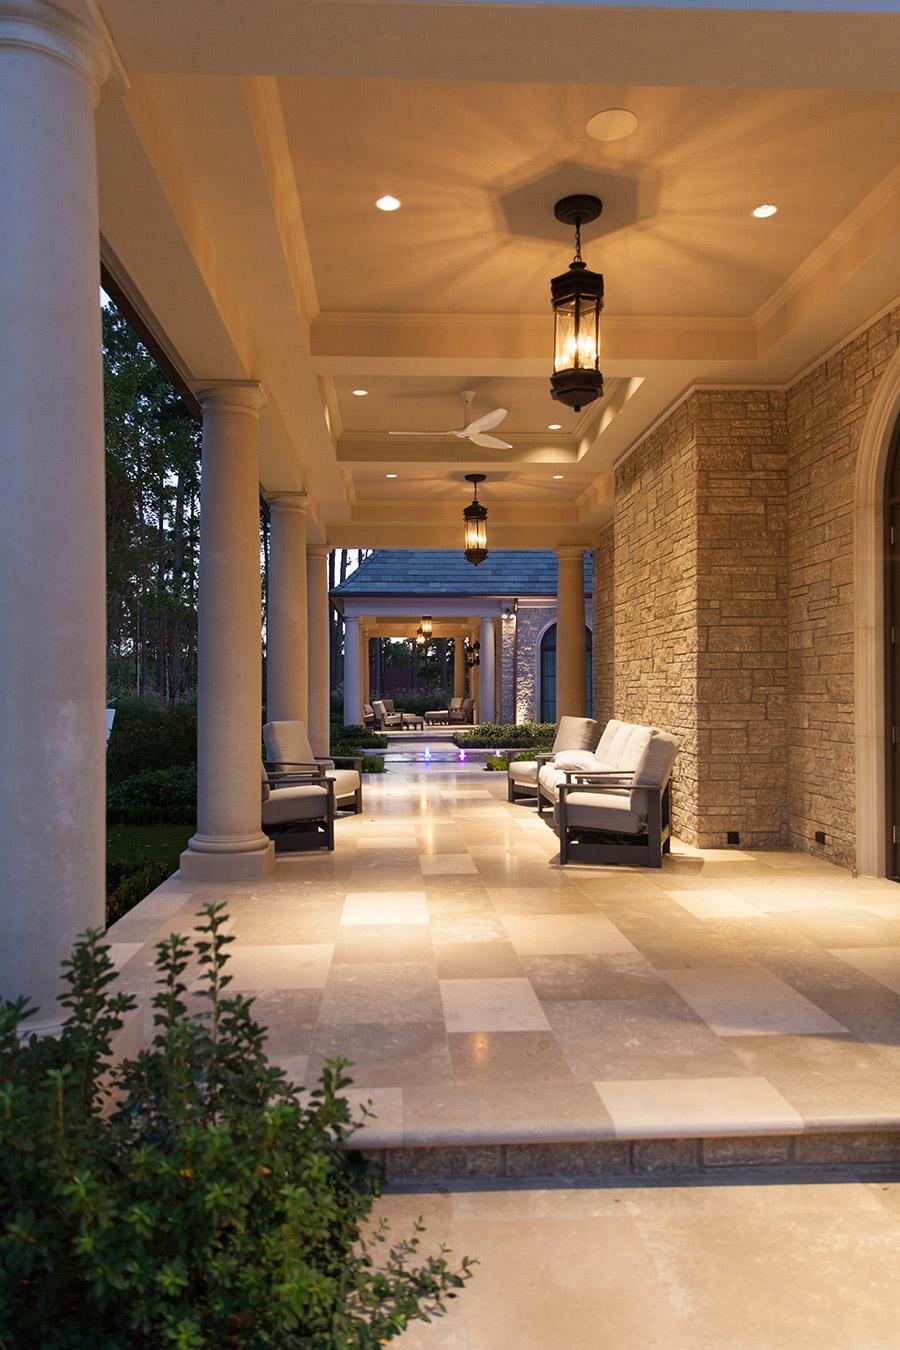 15-Tom-Diebel--Winston-Residence-Lufkin,-TX--Harlequin-(104)